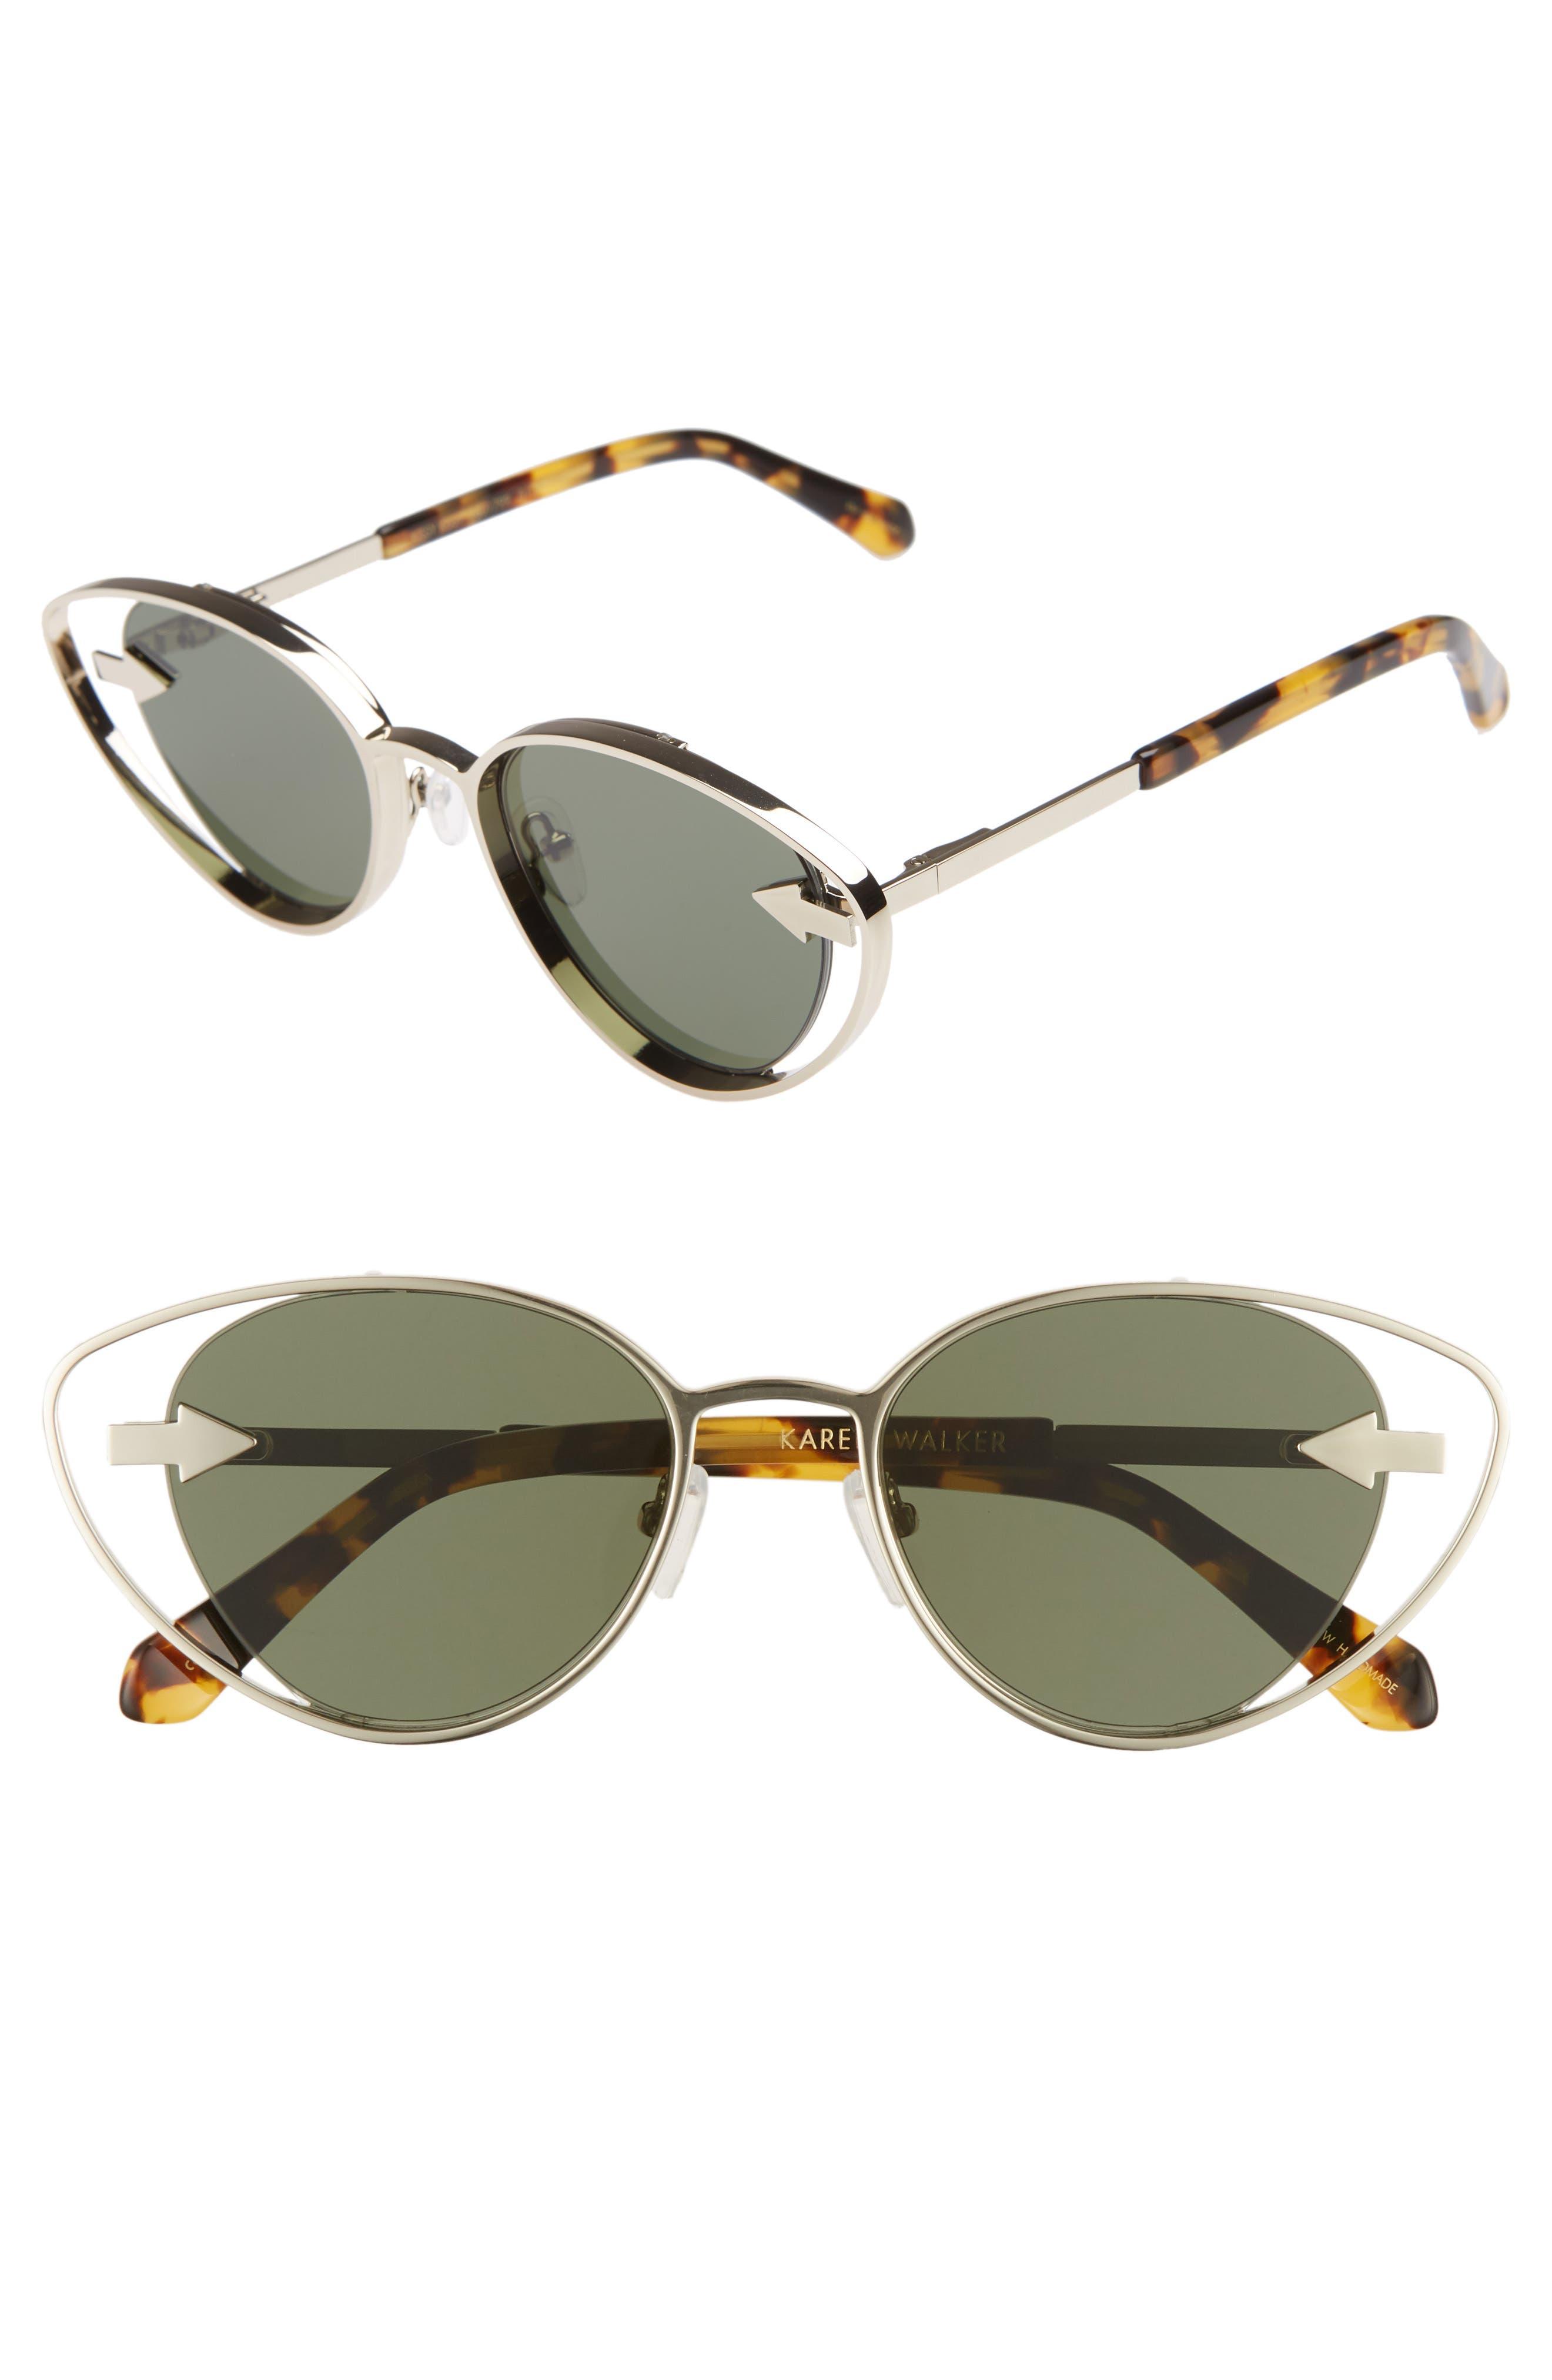 Kissy Kissy 51mm Cat Eye Sunglasses,                             Main thumbnail 1, color,                             GOLD/ TORTOISE